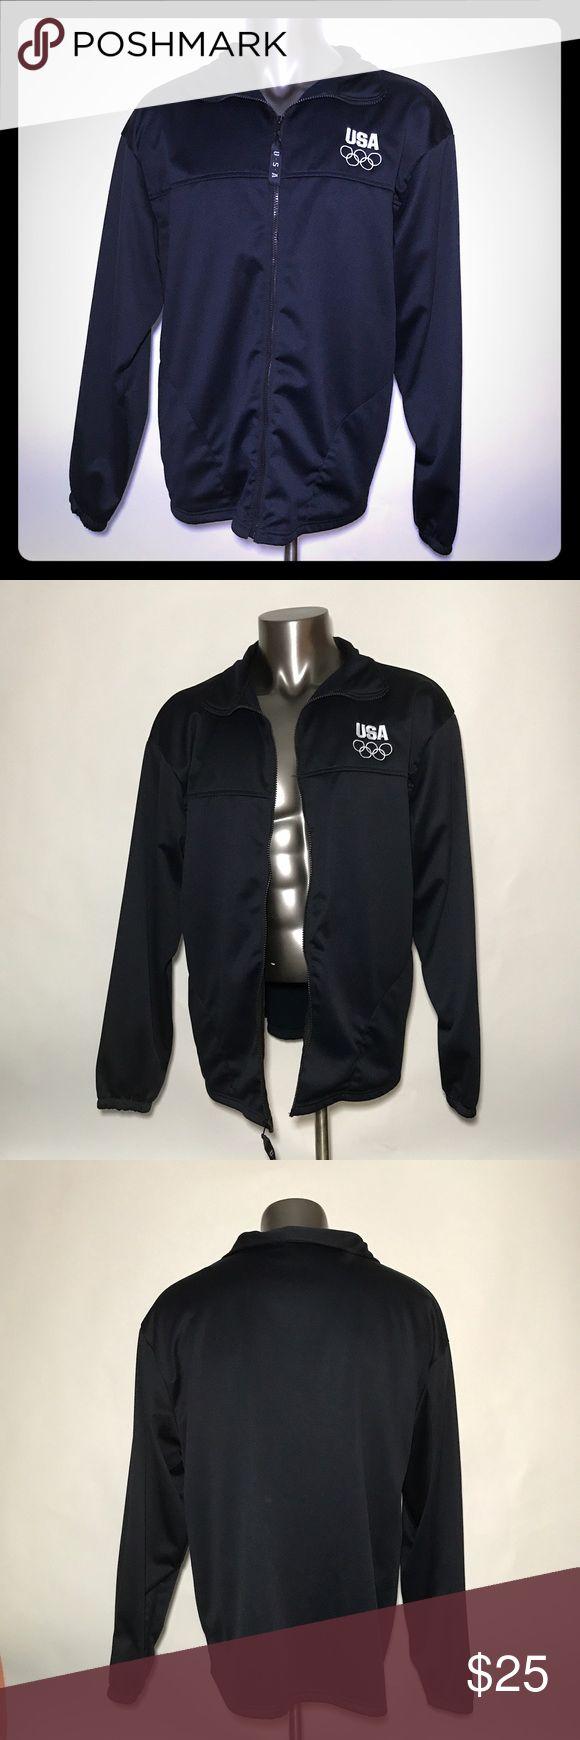 USA Olympic Committee Warm Up Jacket Blue XXL USA United States Olympic Committee Warm Up Jacket Blue men's XXLarge Zip EUC USA Olympic Jackets & Coats Lightweight & Shirt Jackets